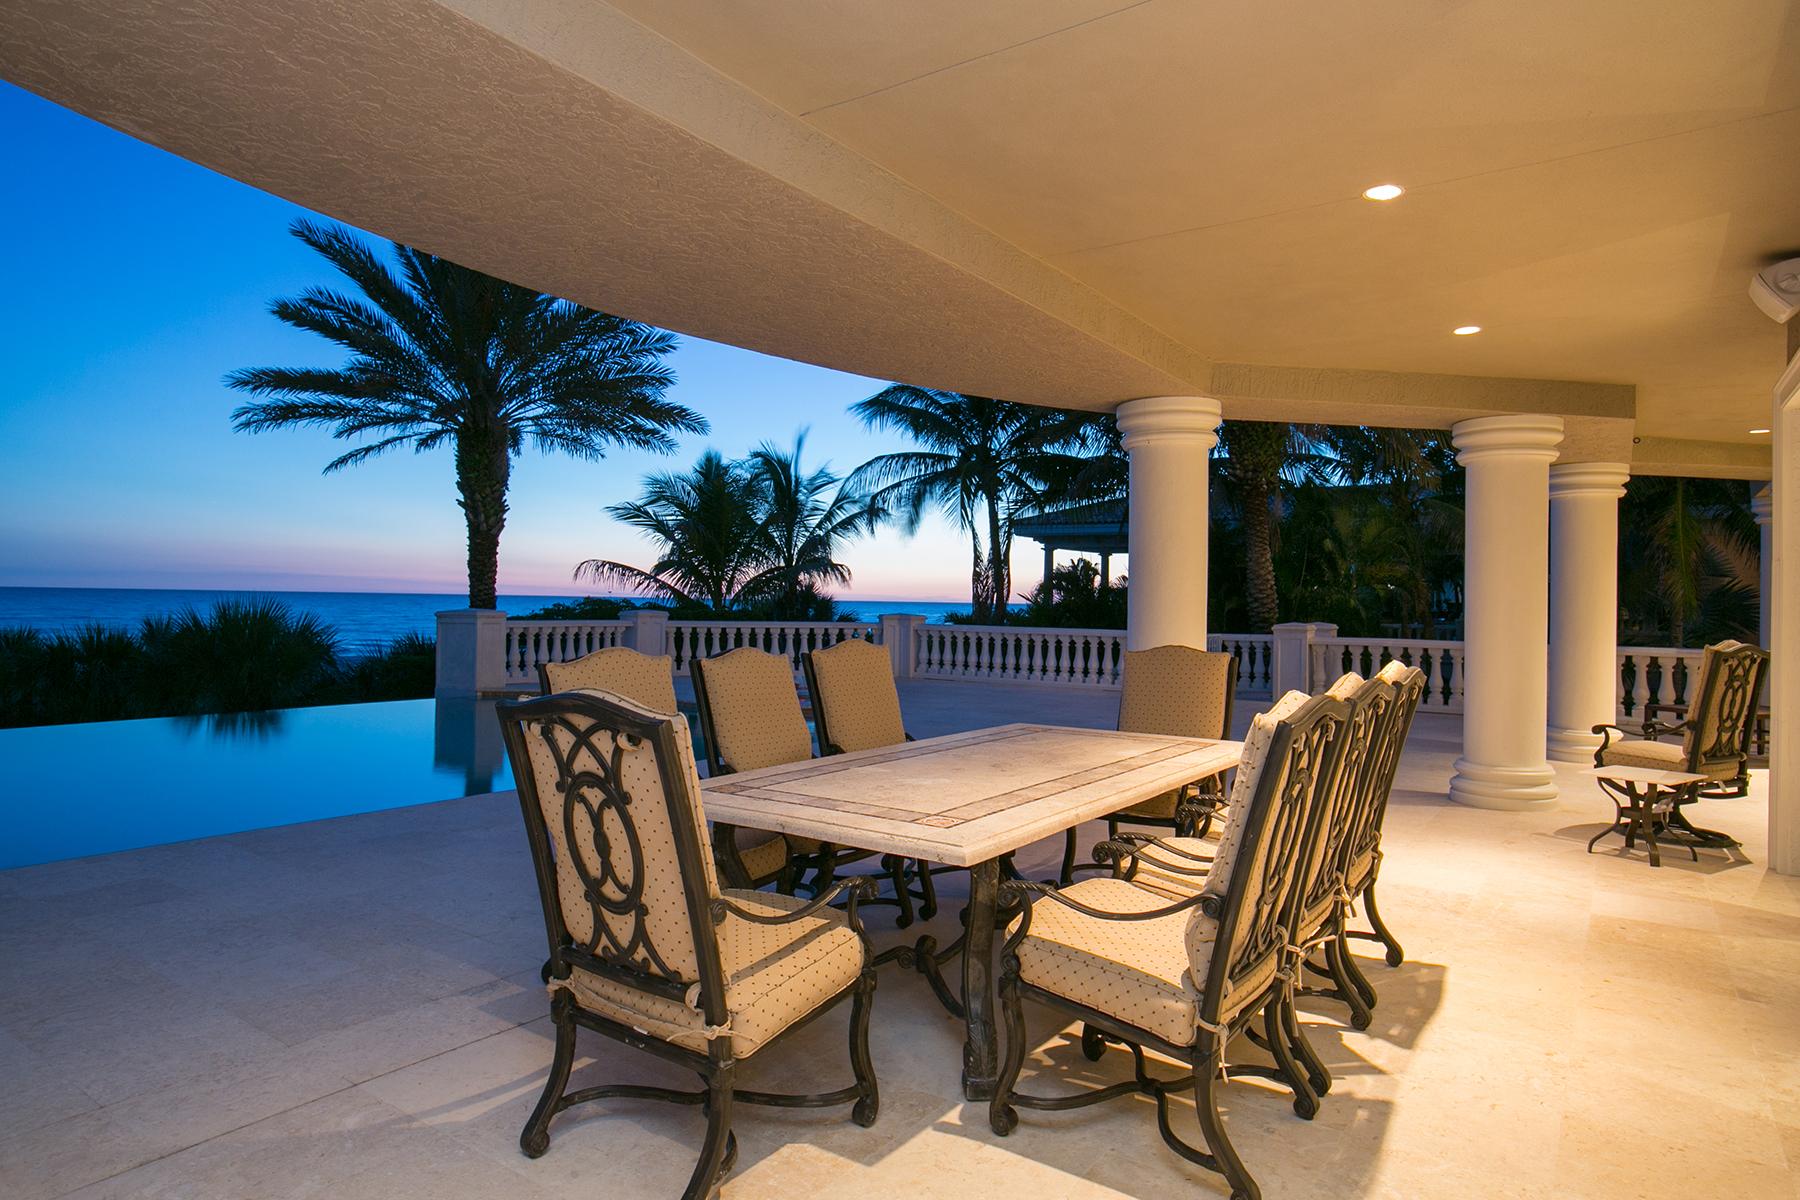 Additional photo for property listing at LONGBOAT KEY 825  Longboat Club Rd,  Longboat Key, Florida 34228 United States